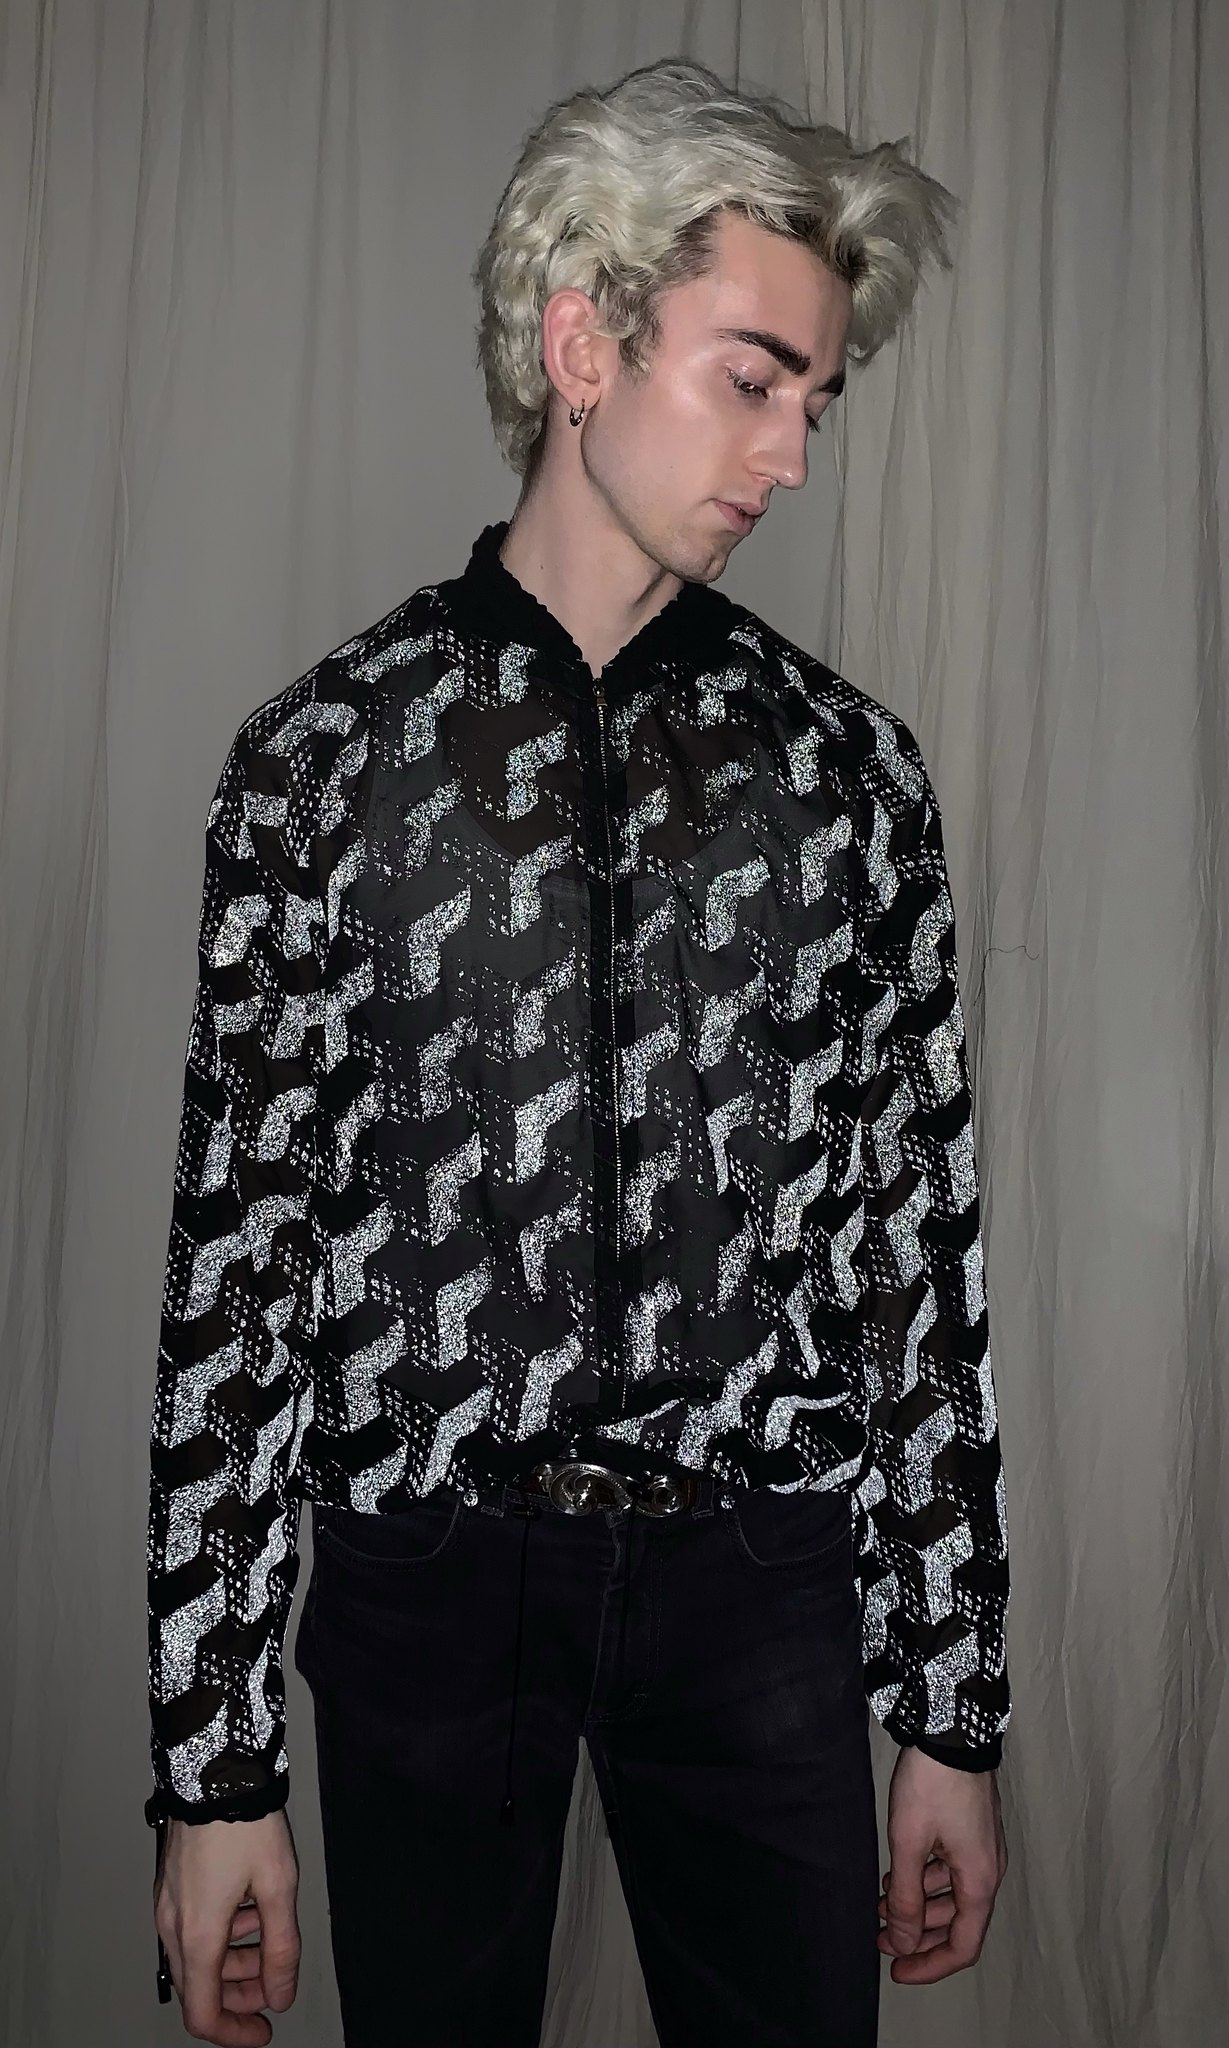 Retroreflective jacket